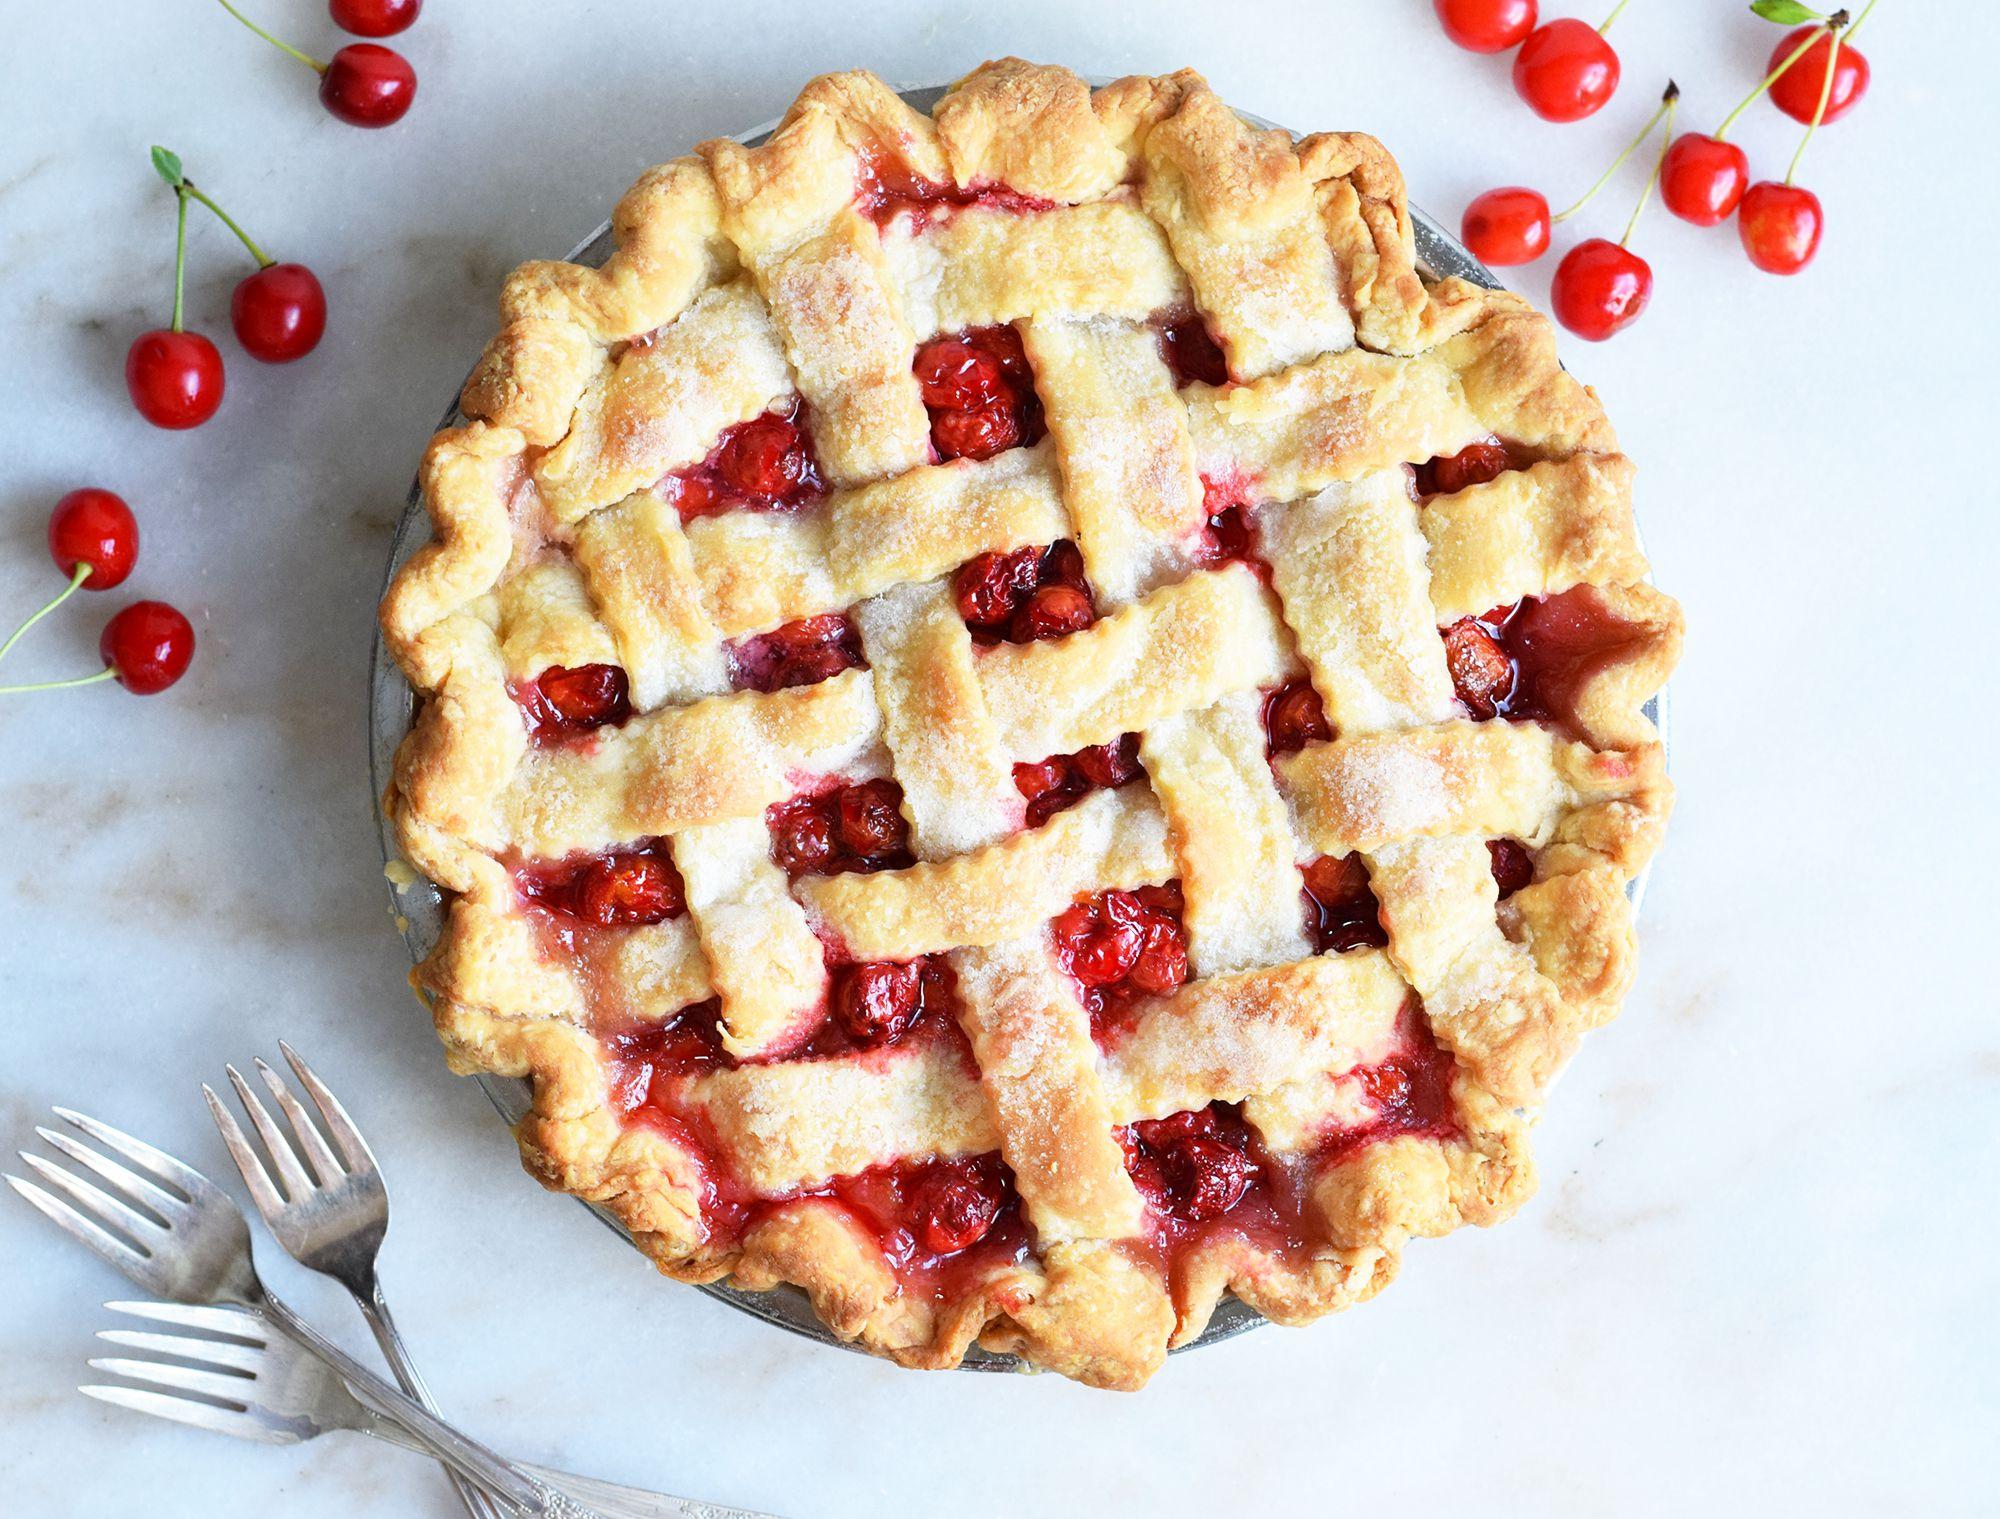 Use Summer Cherries to Make an Irresistible Lattice Crust Pie